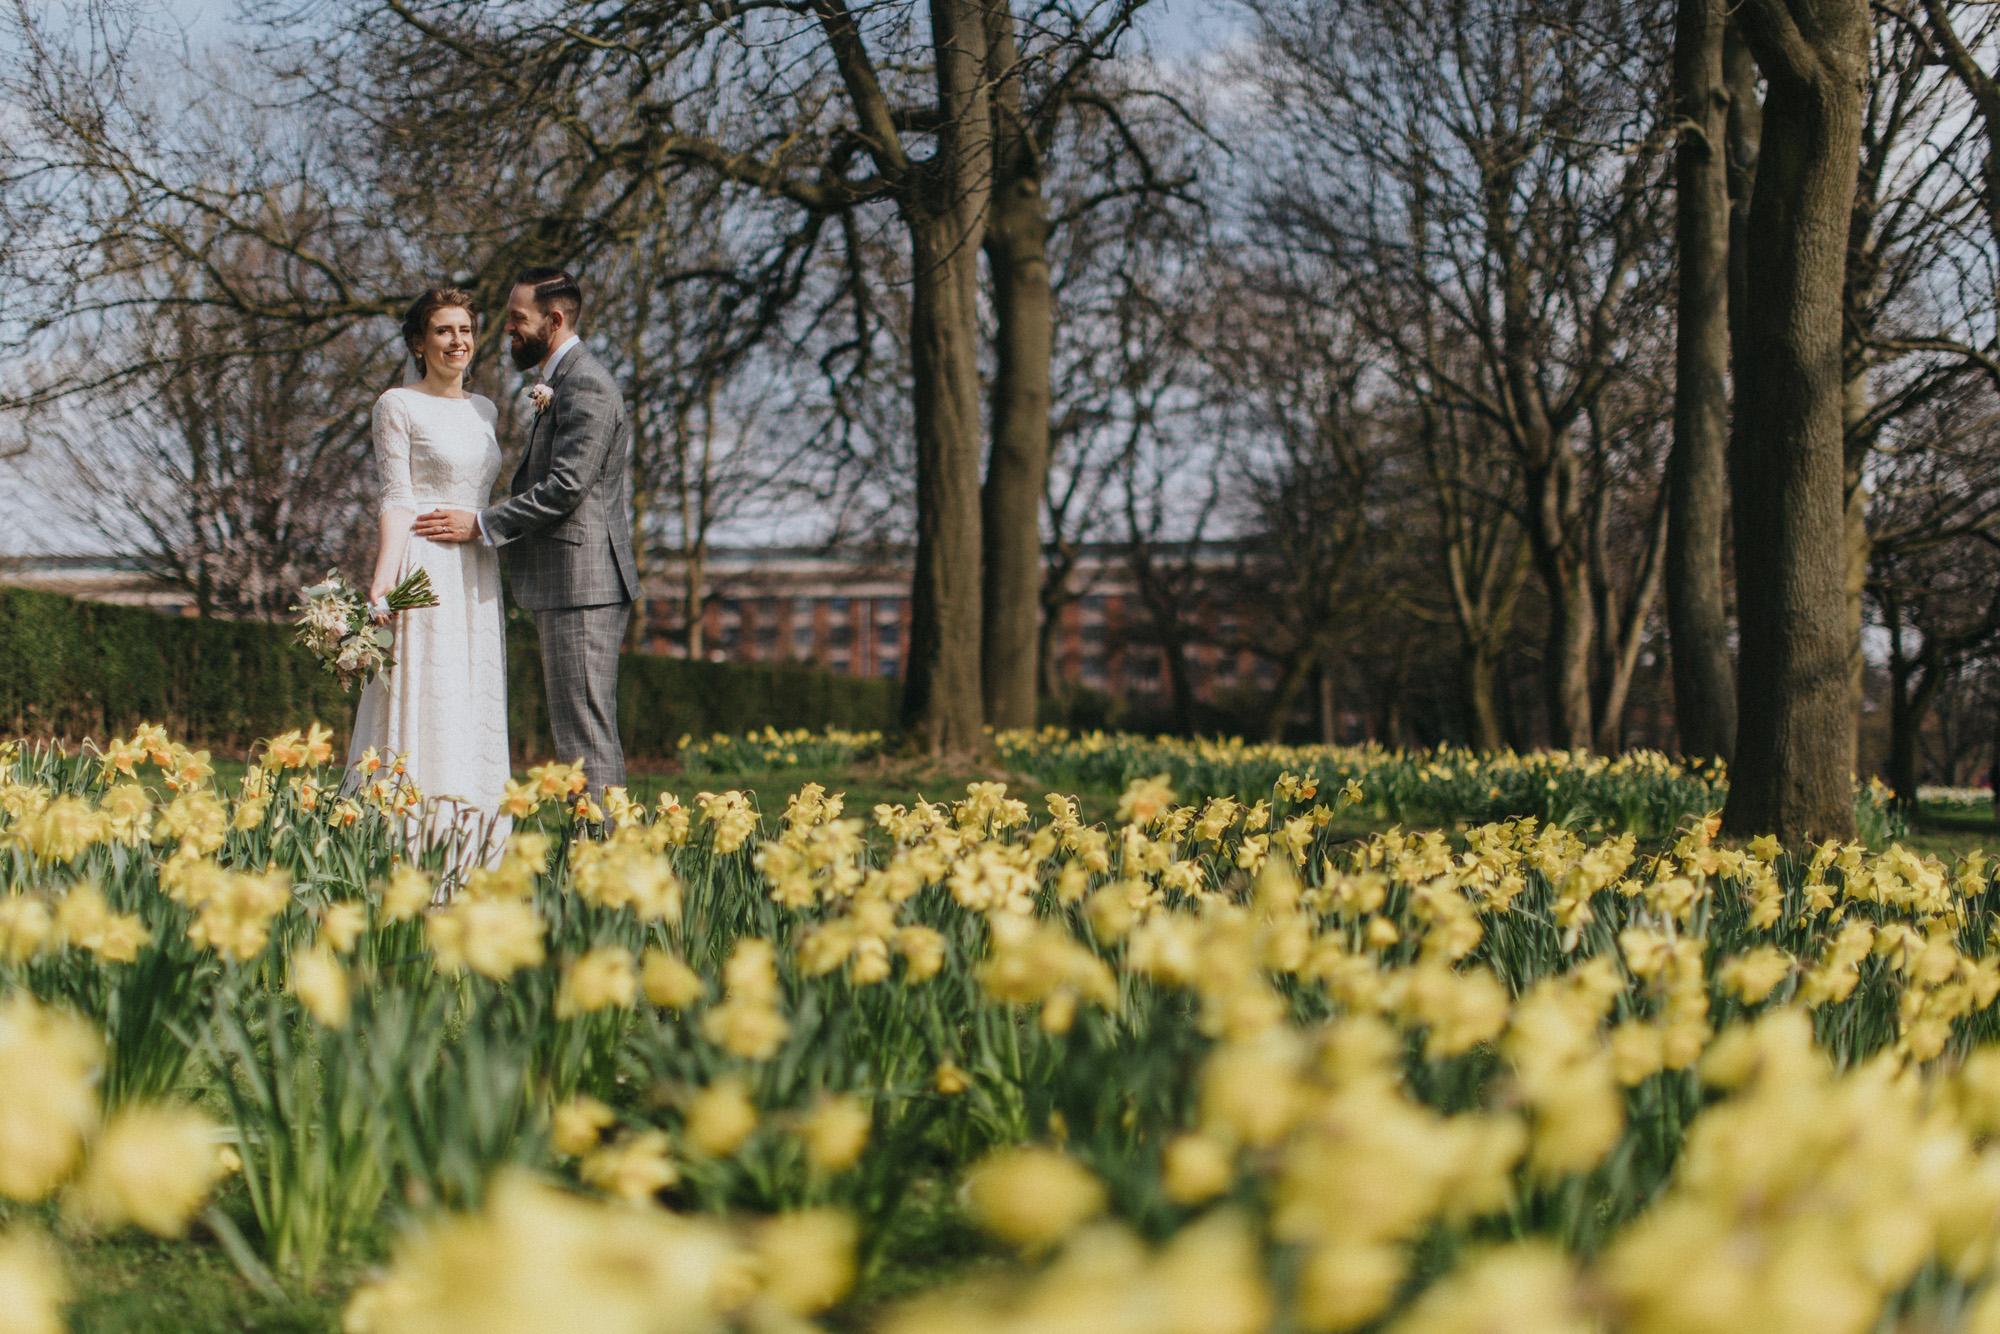 Kate-Beaumont-Lace-Flared-Dahlia-Gown-Leeds-Wedding-Bloom-Weddings-34.jpg